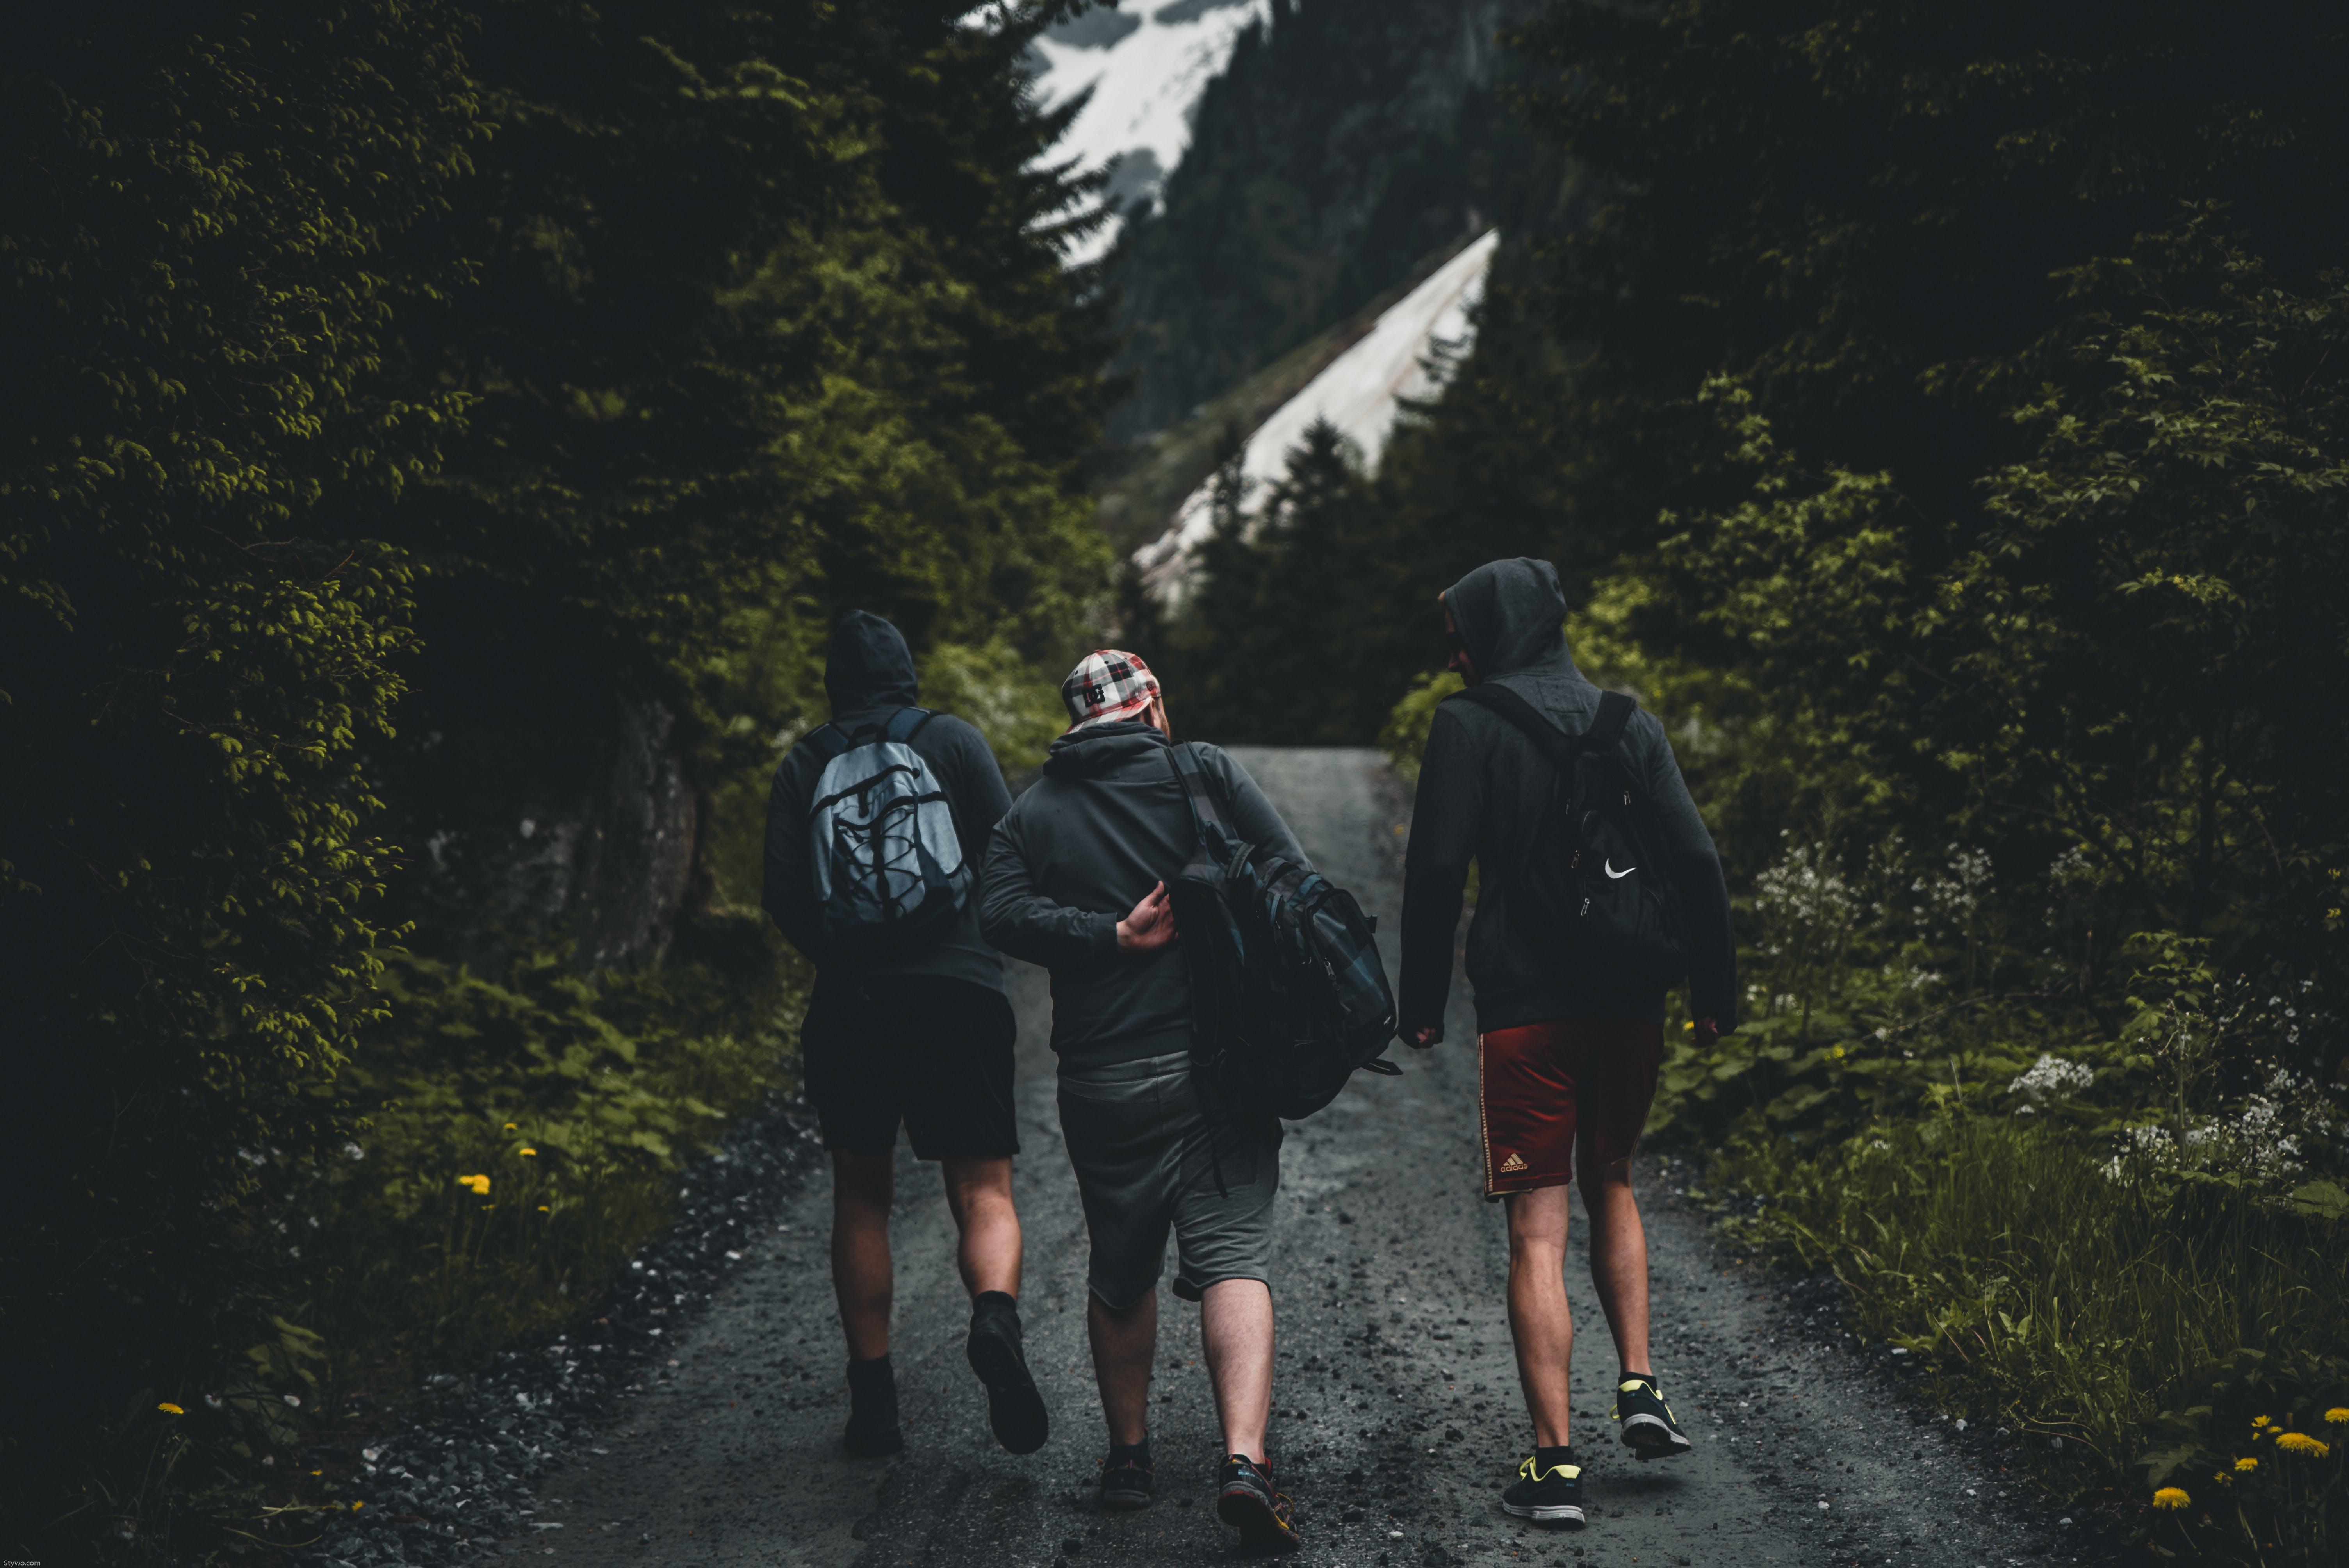 Three Men Walking on Road Between Tall Trees